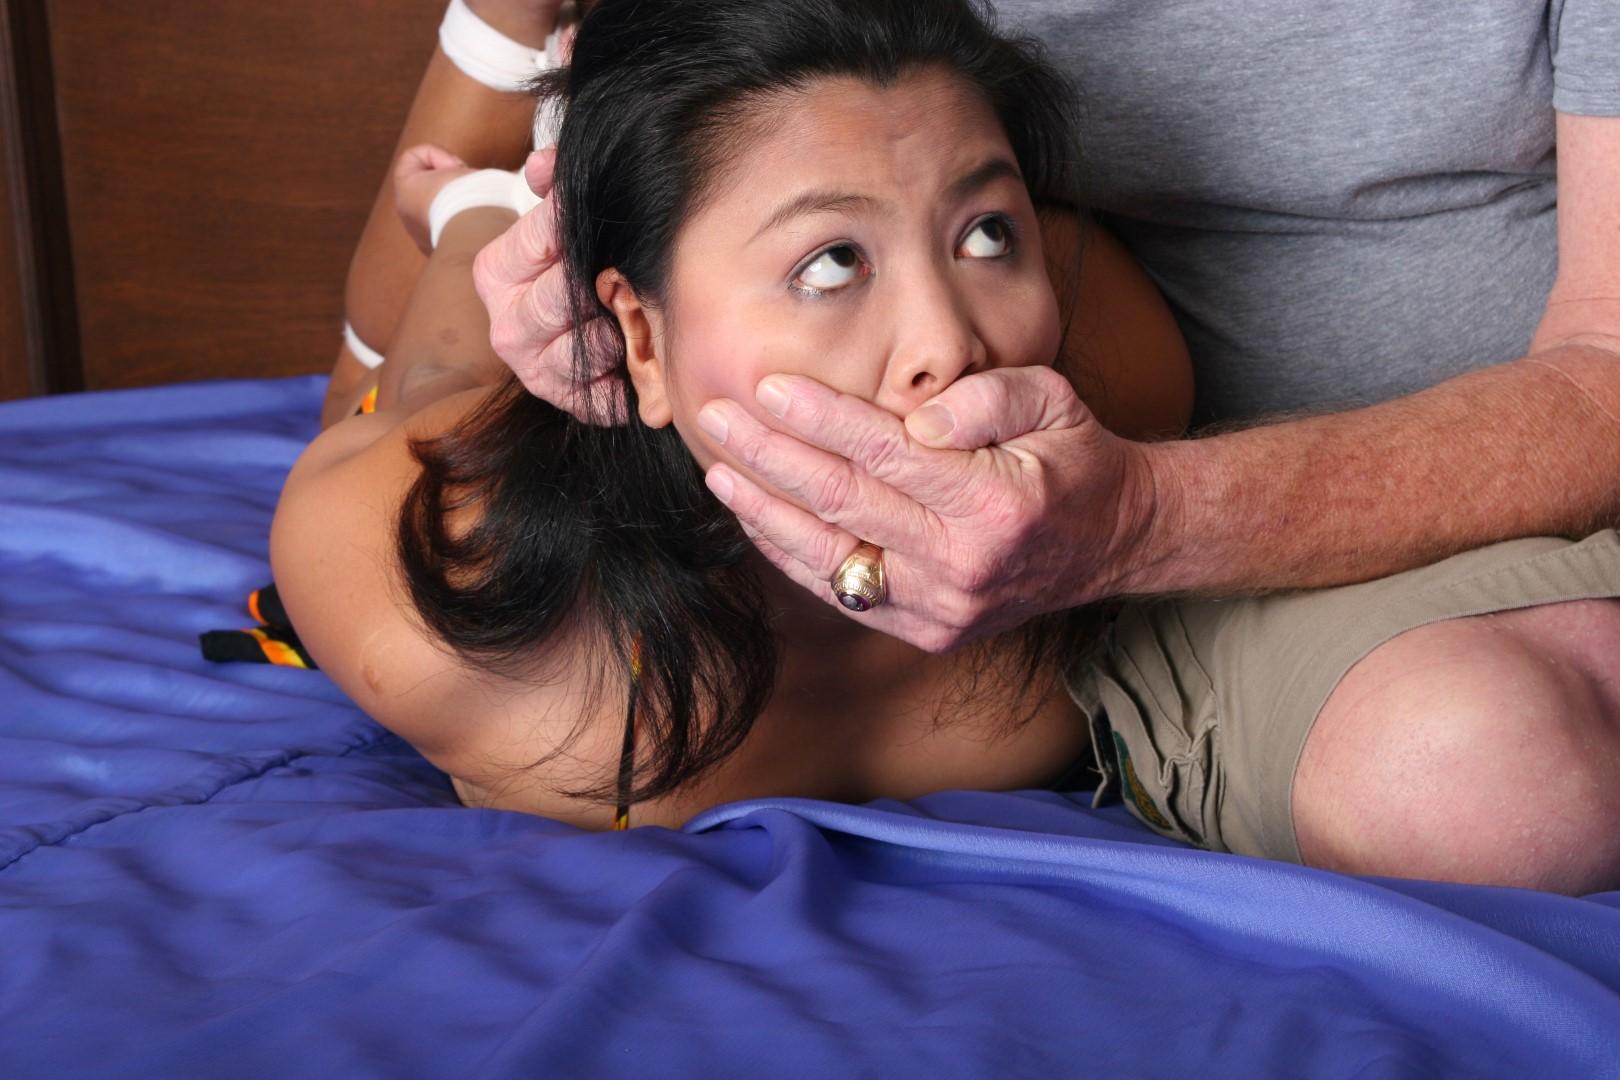 Free anal fisting tube 8 vids